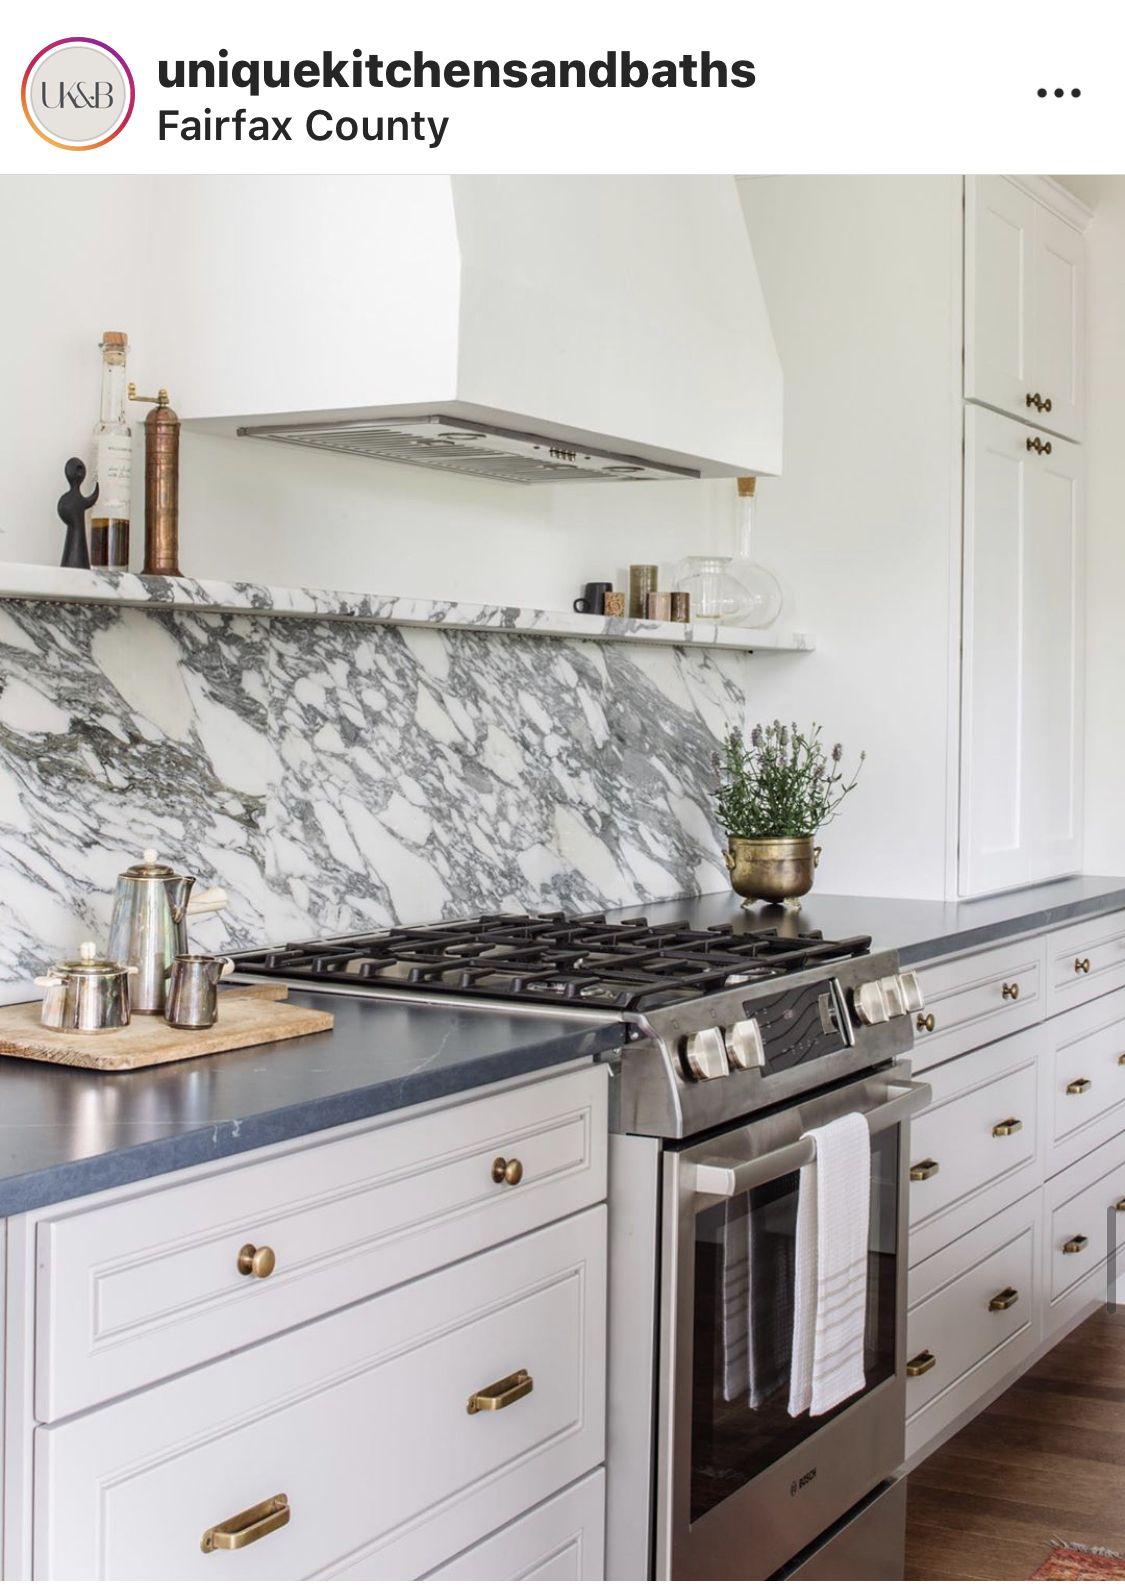 53 Unique Small House Kitchen Ideas 10 In 2020 Rustic Kitchen